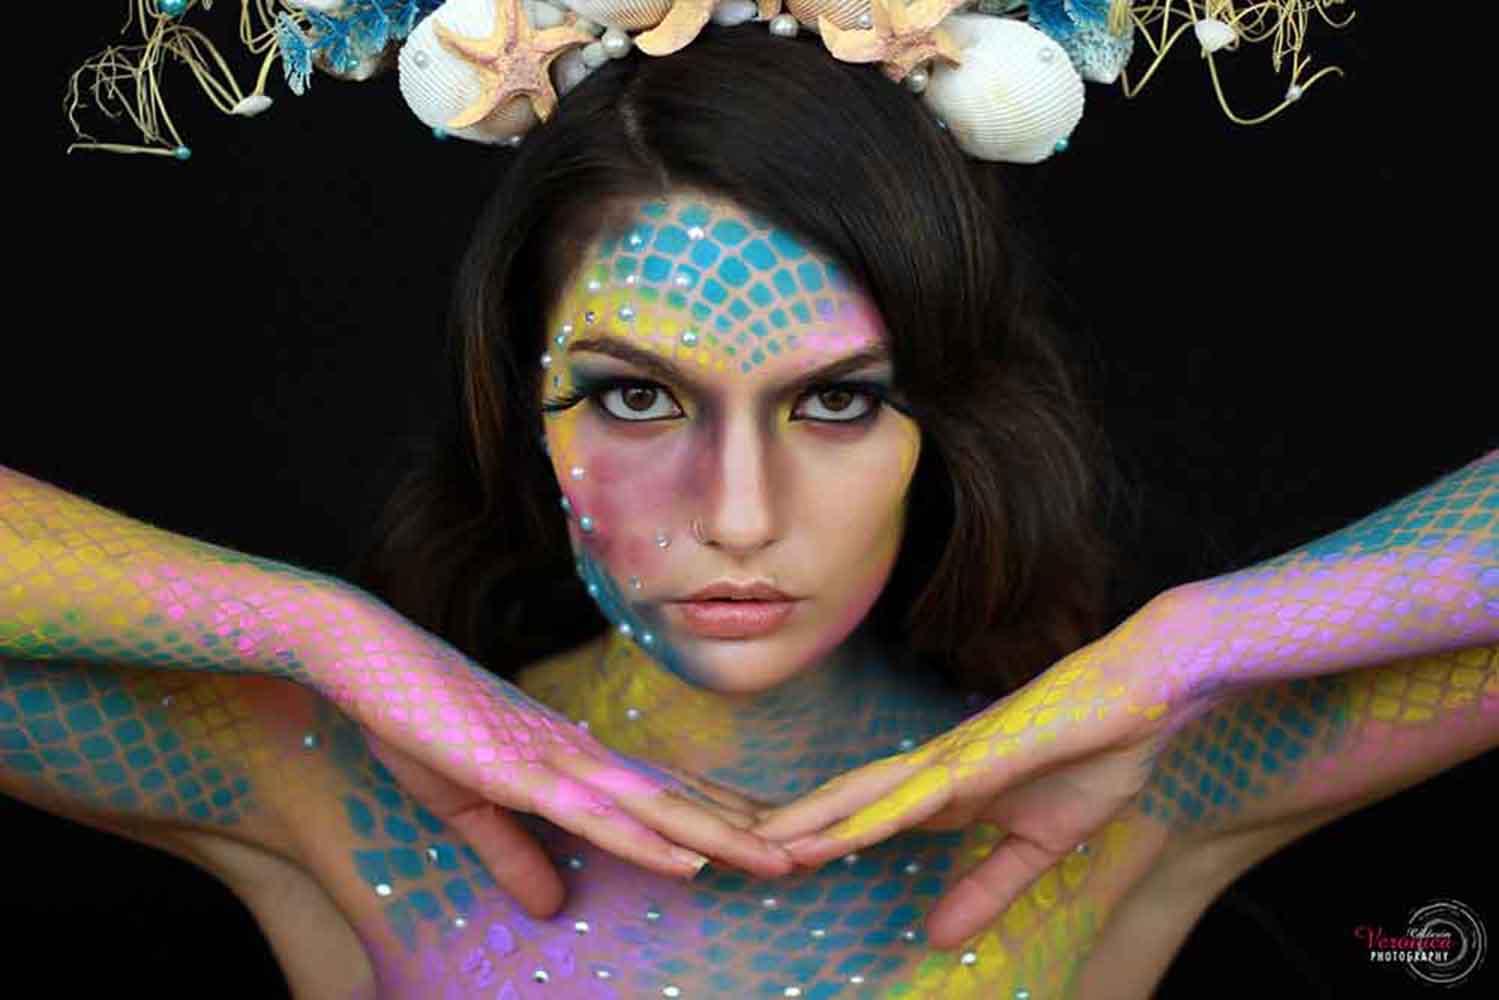 maquillaje de caracterización fantasía pestañas bodypainting escamas sirena Verónica Calderón